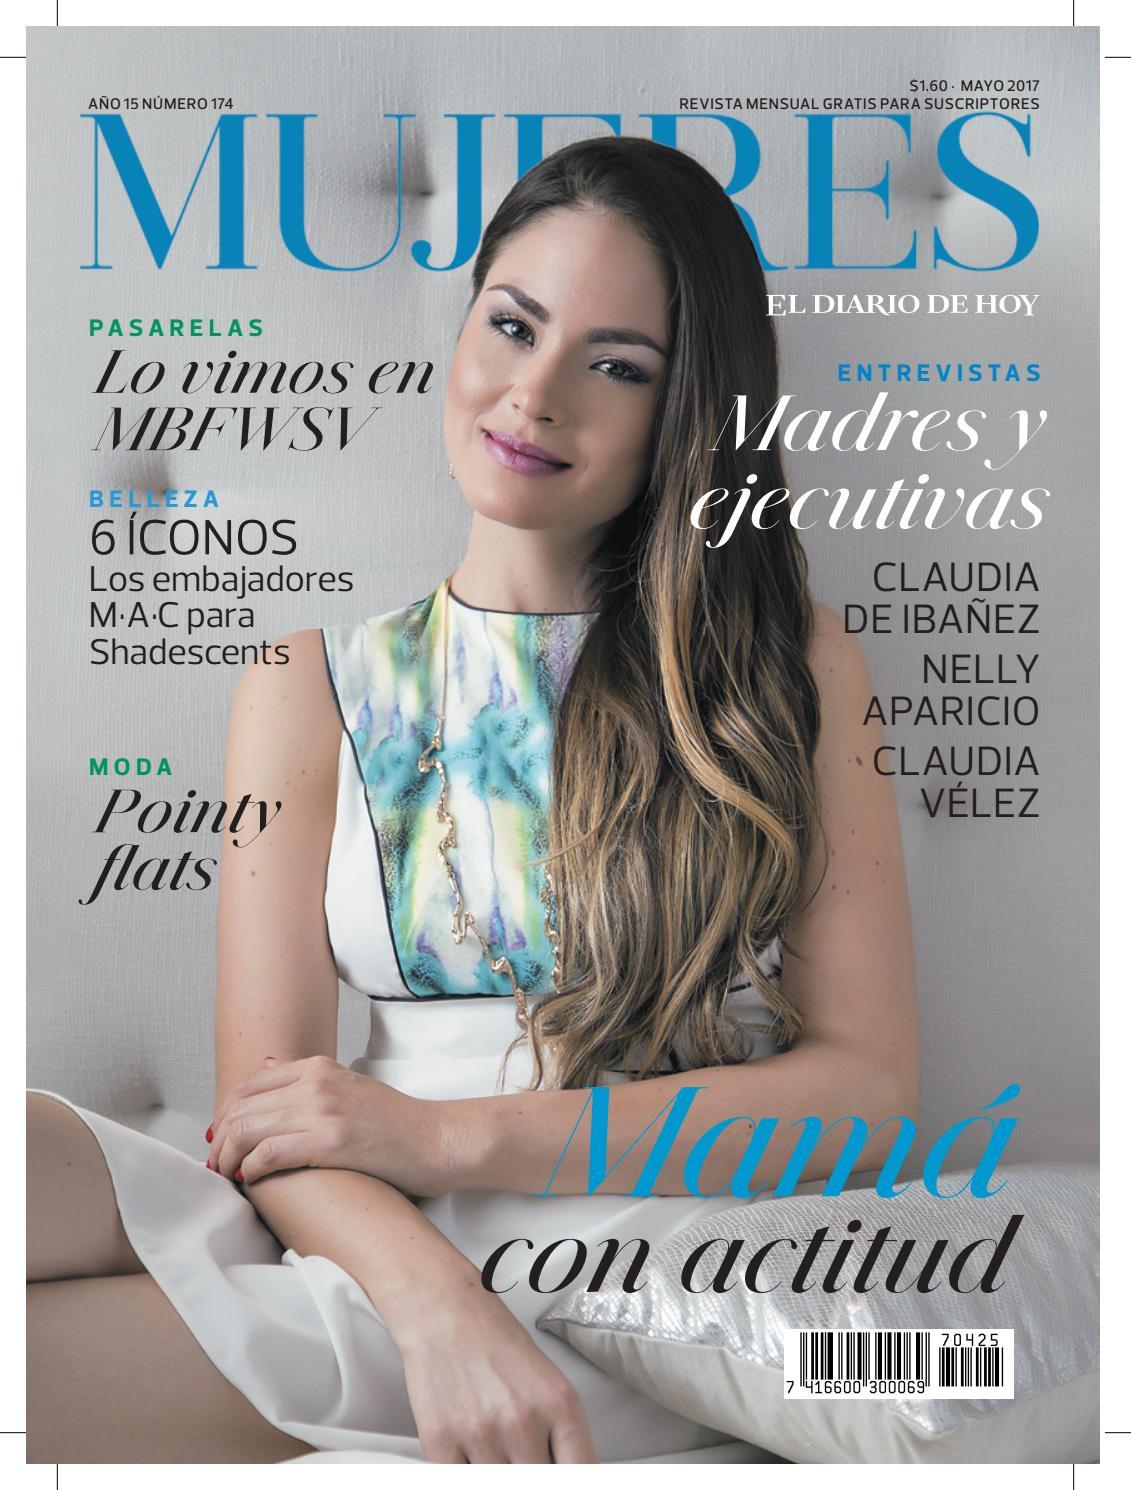 MUJERES Mayo 2017 by Grupo Editorial Altamirano - issuu 100bc0069d73